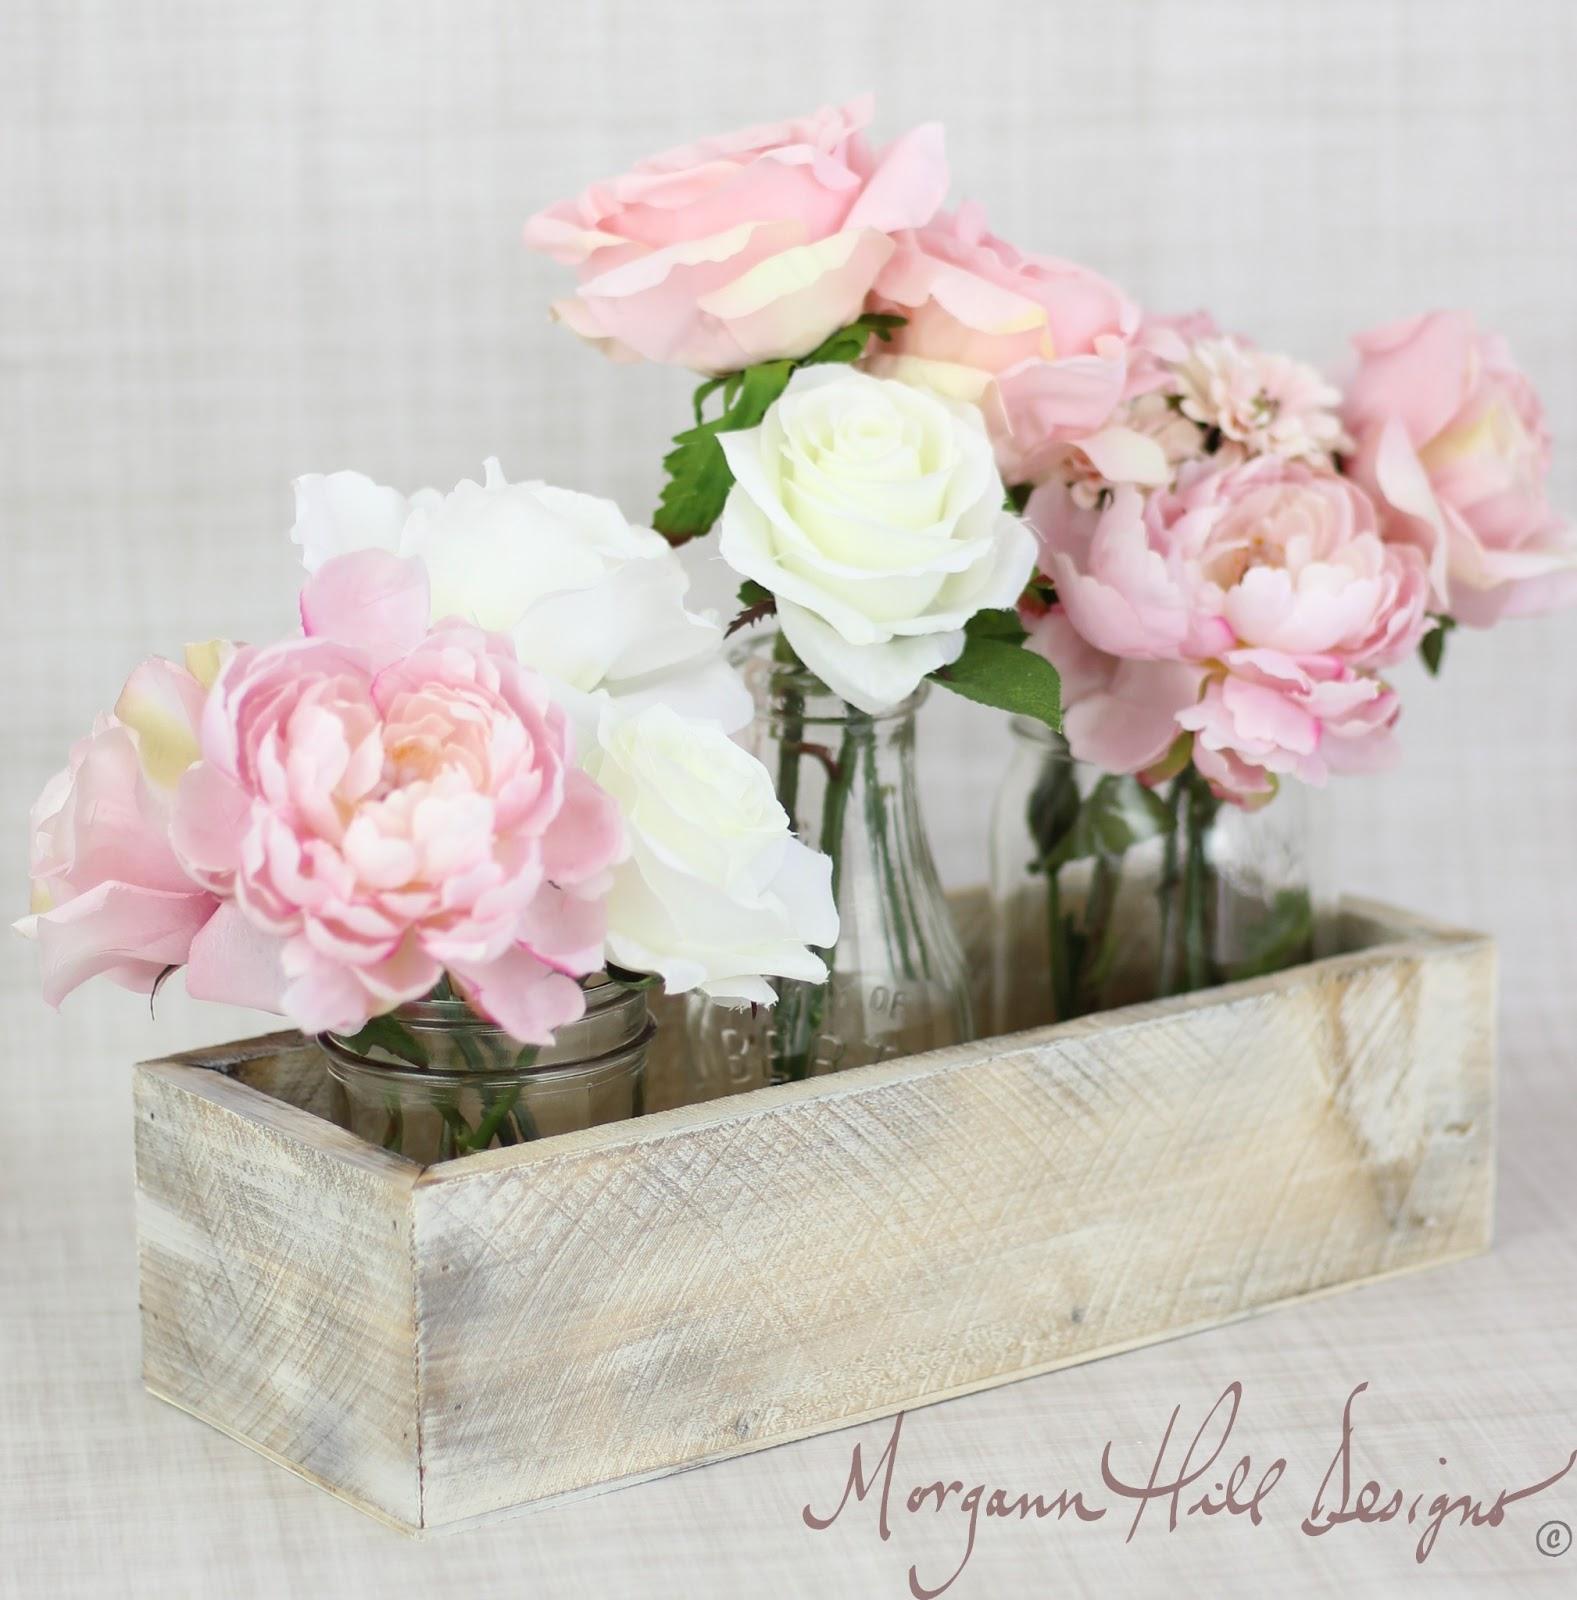 Morgann Hill Designs: Rustic Chic Planter Box Wedding Centerpiece ...